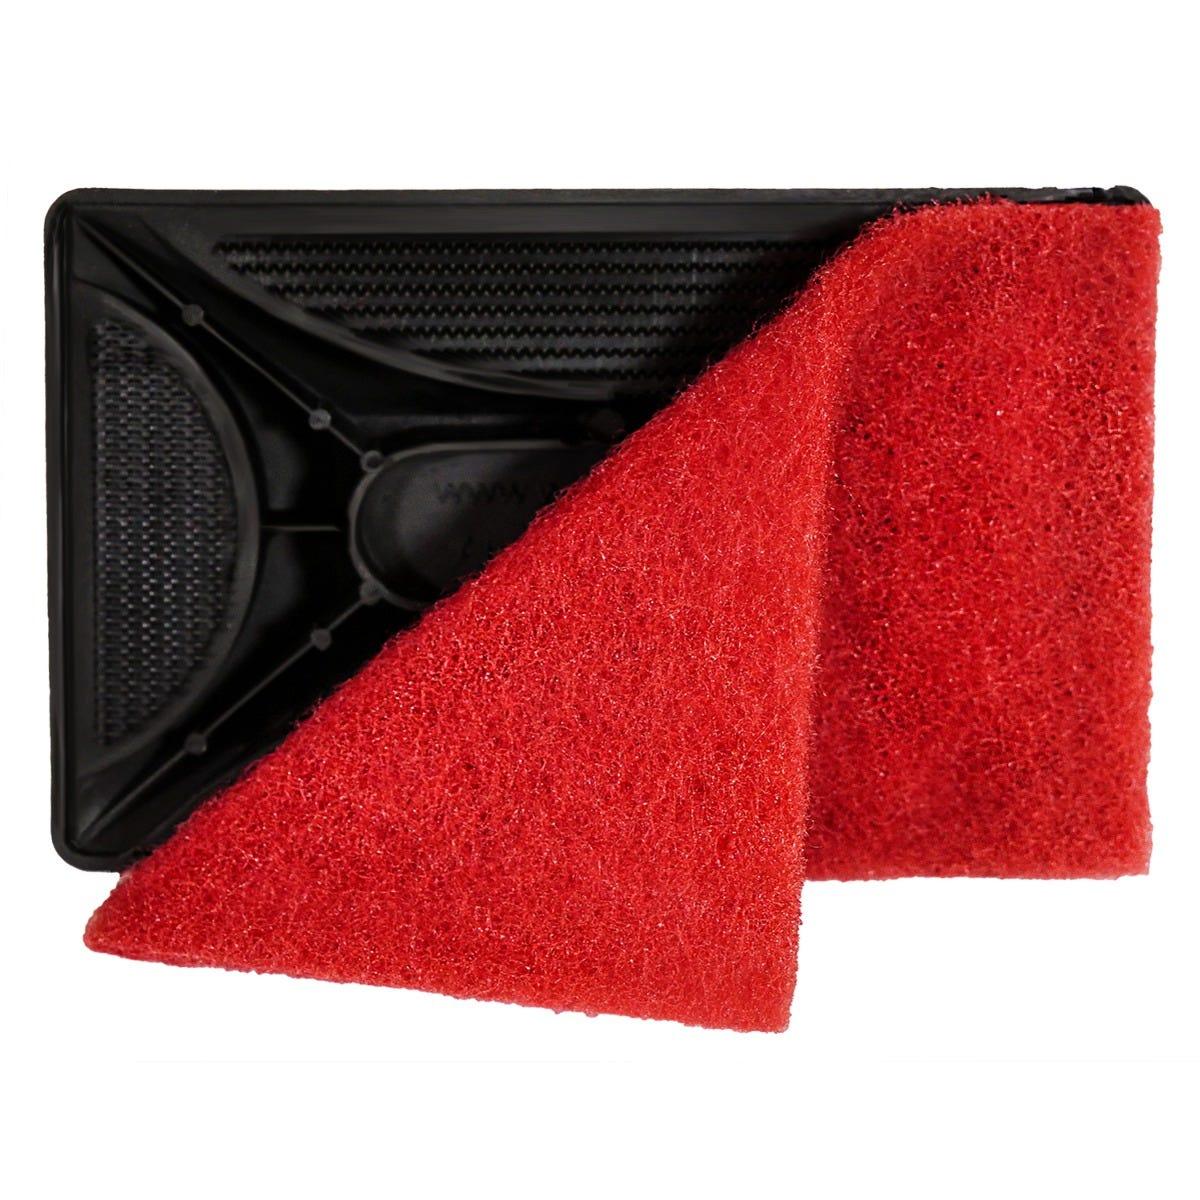 Cooktop scrubbing pad up close